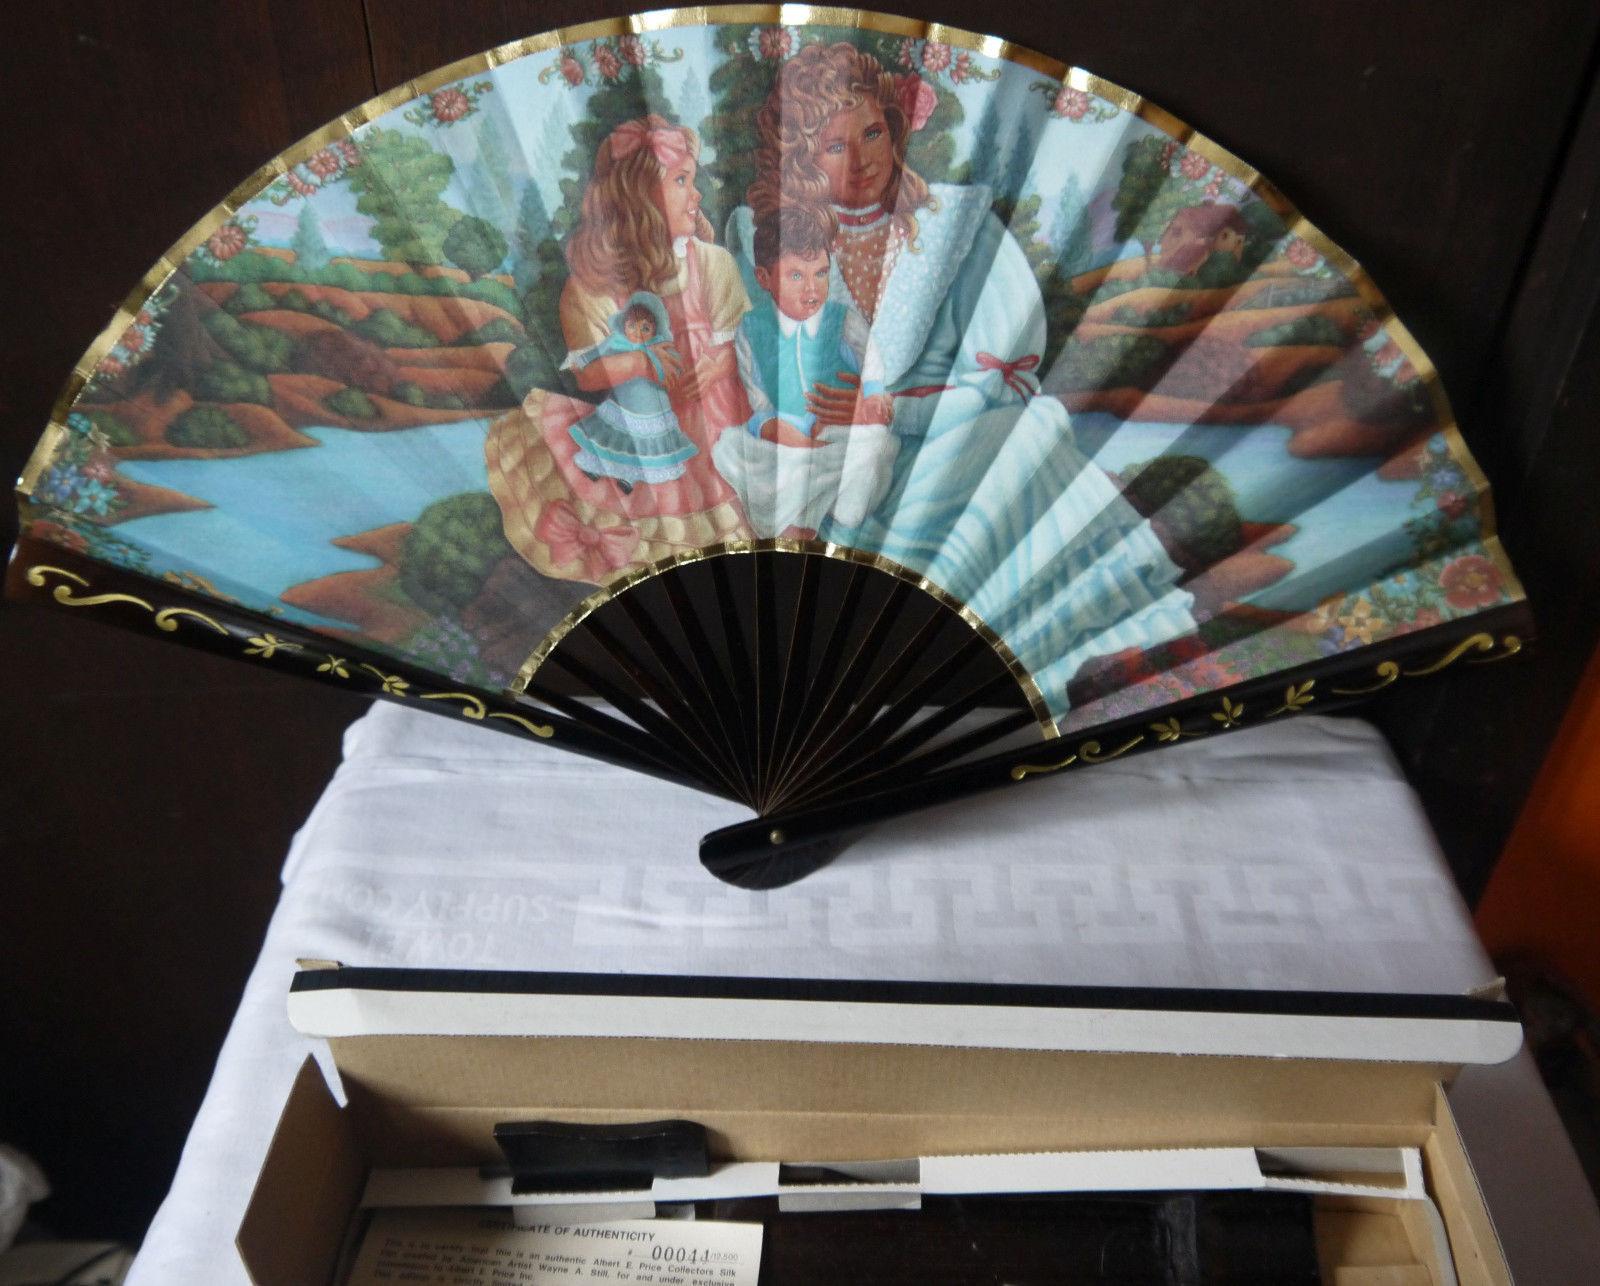 HAND HELD Silk fan albert price CREATED BY AMERICAN ARTIST WAYNE A. STILL collec - $11.87